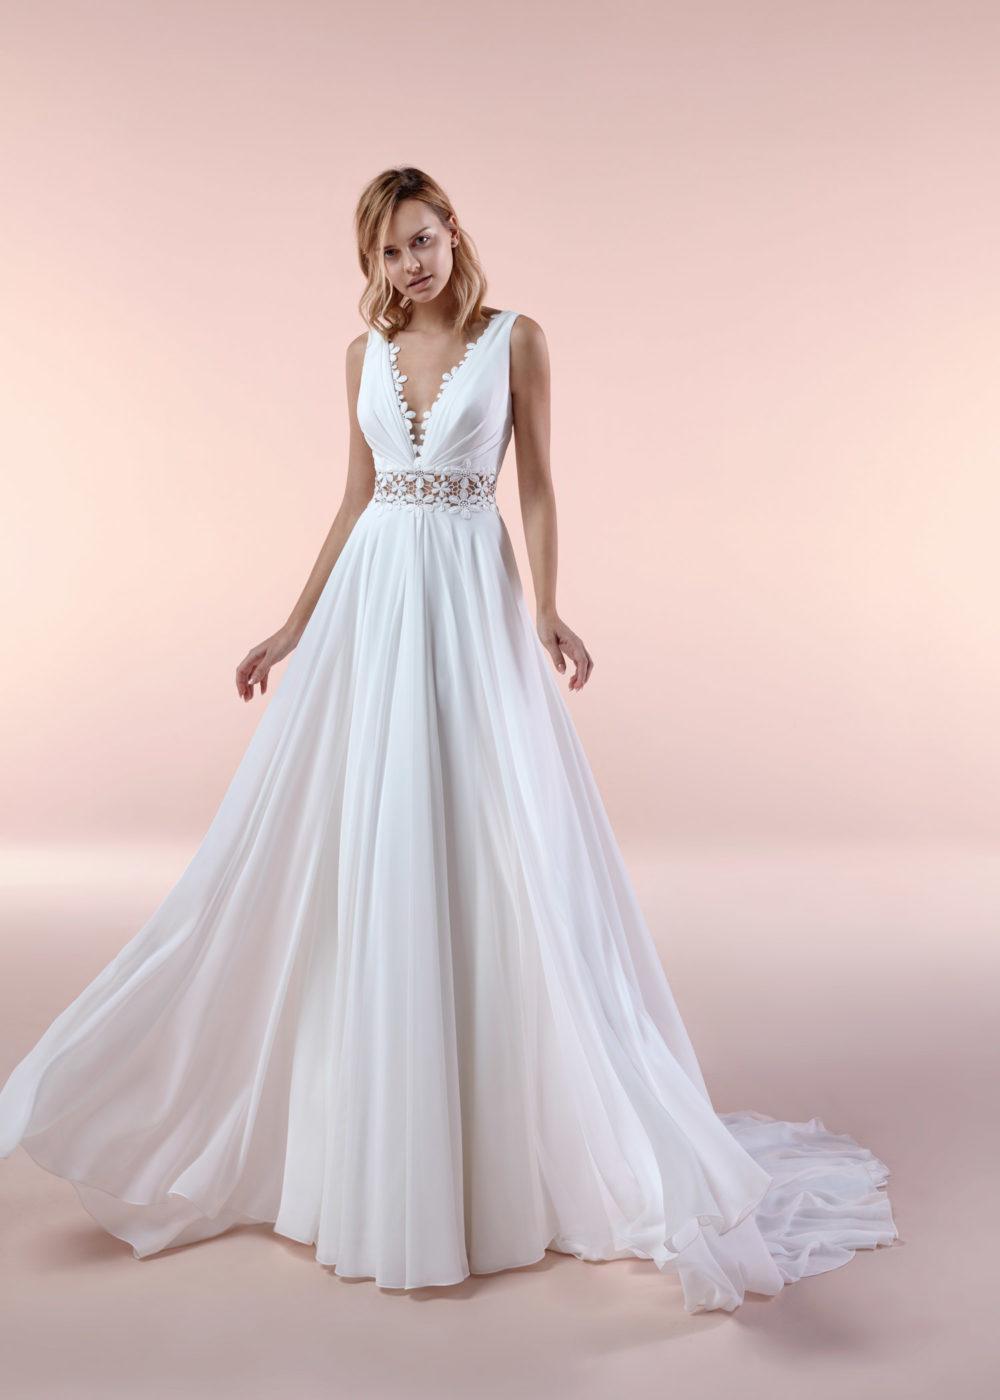 Mariages: Abito da sposa Boho Chic Nicole 2020 a Vicenza Verona Padova Veneto